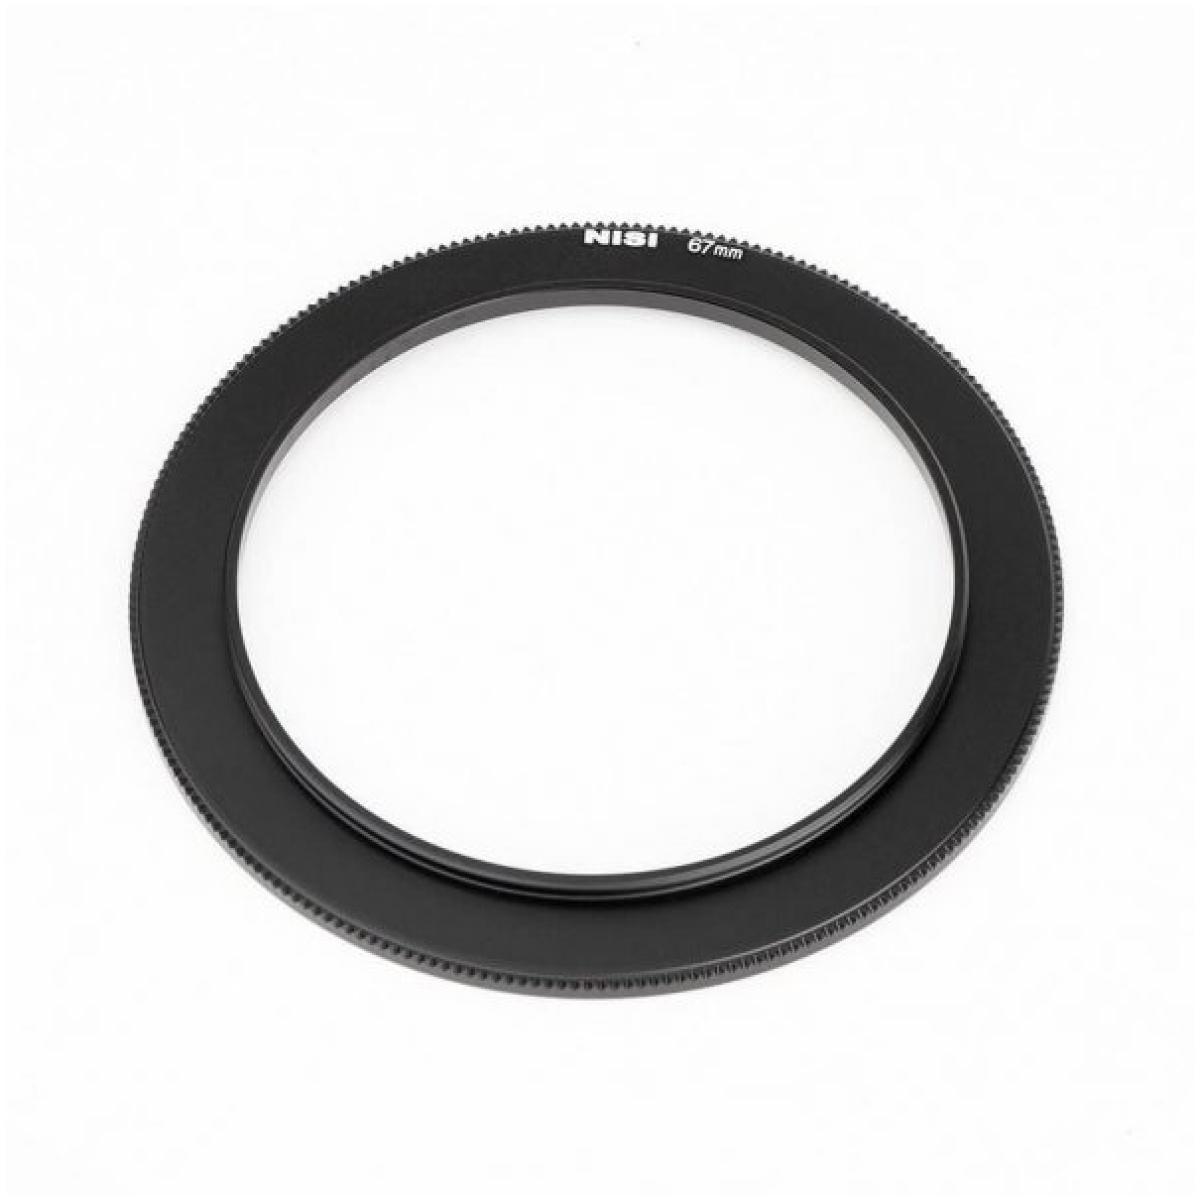 NiSi Adapterring 72 mm für V5 und V5 Pro